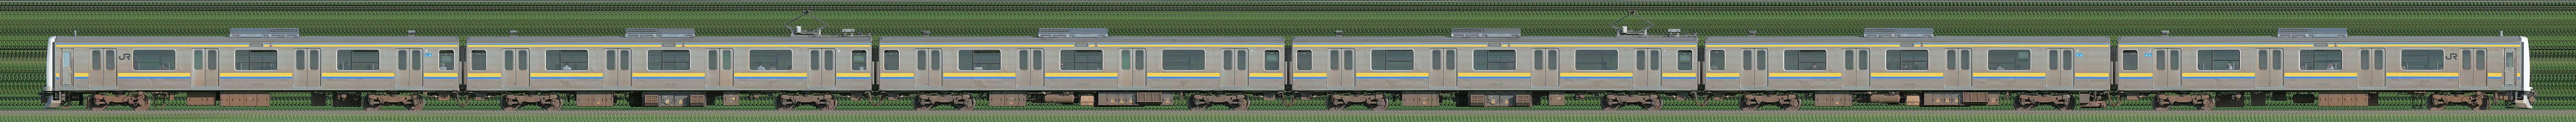 JR東日本 幕張車両センター 209系2100番台C607編成(山側)の編成サイドビュー